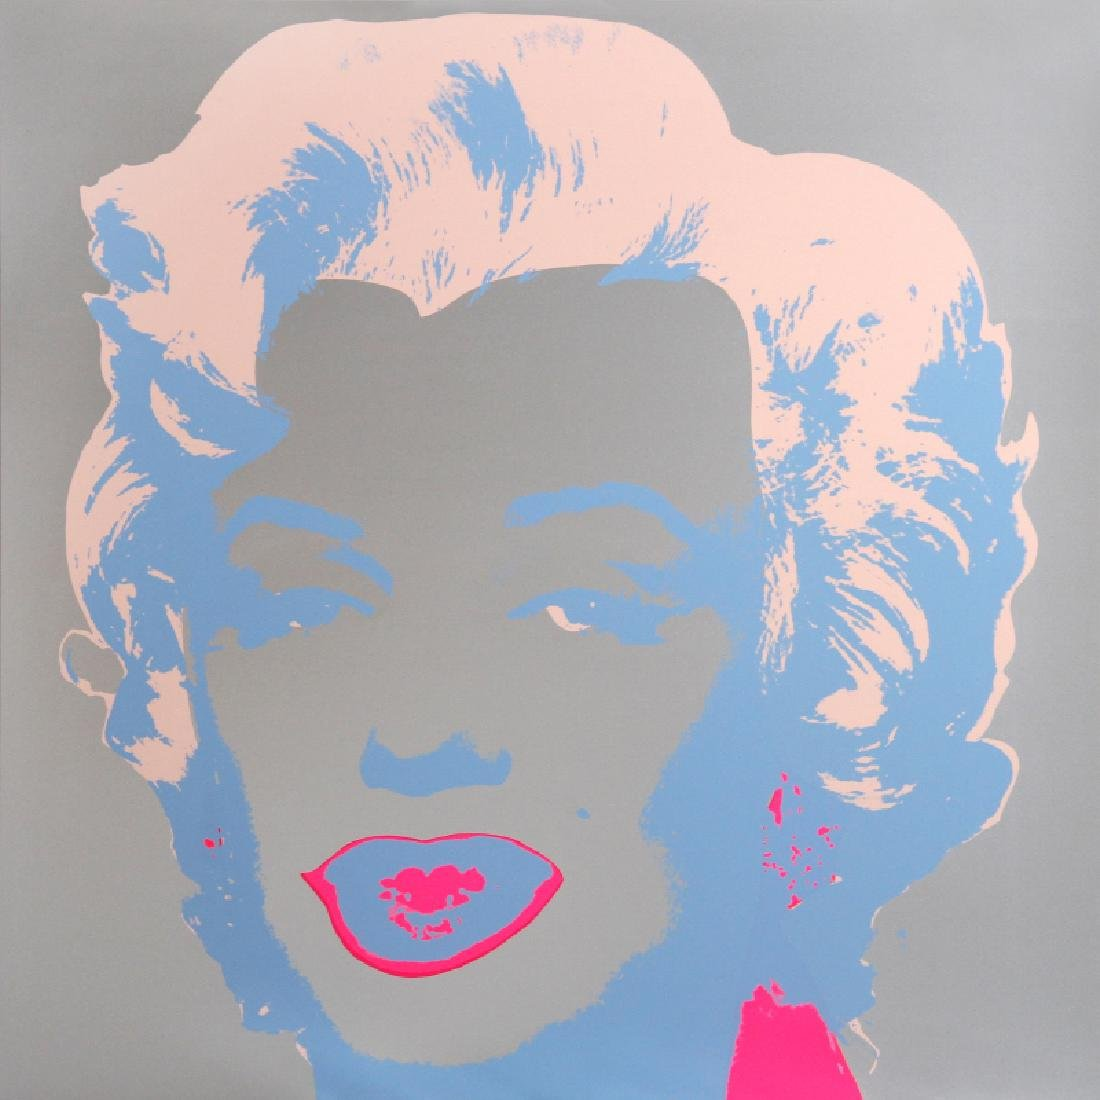 Andy Warhol, Marilyn Monroe 5, Serigraph, stamped verso